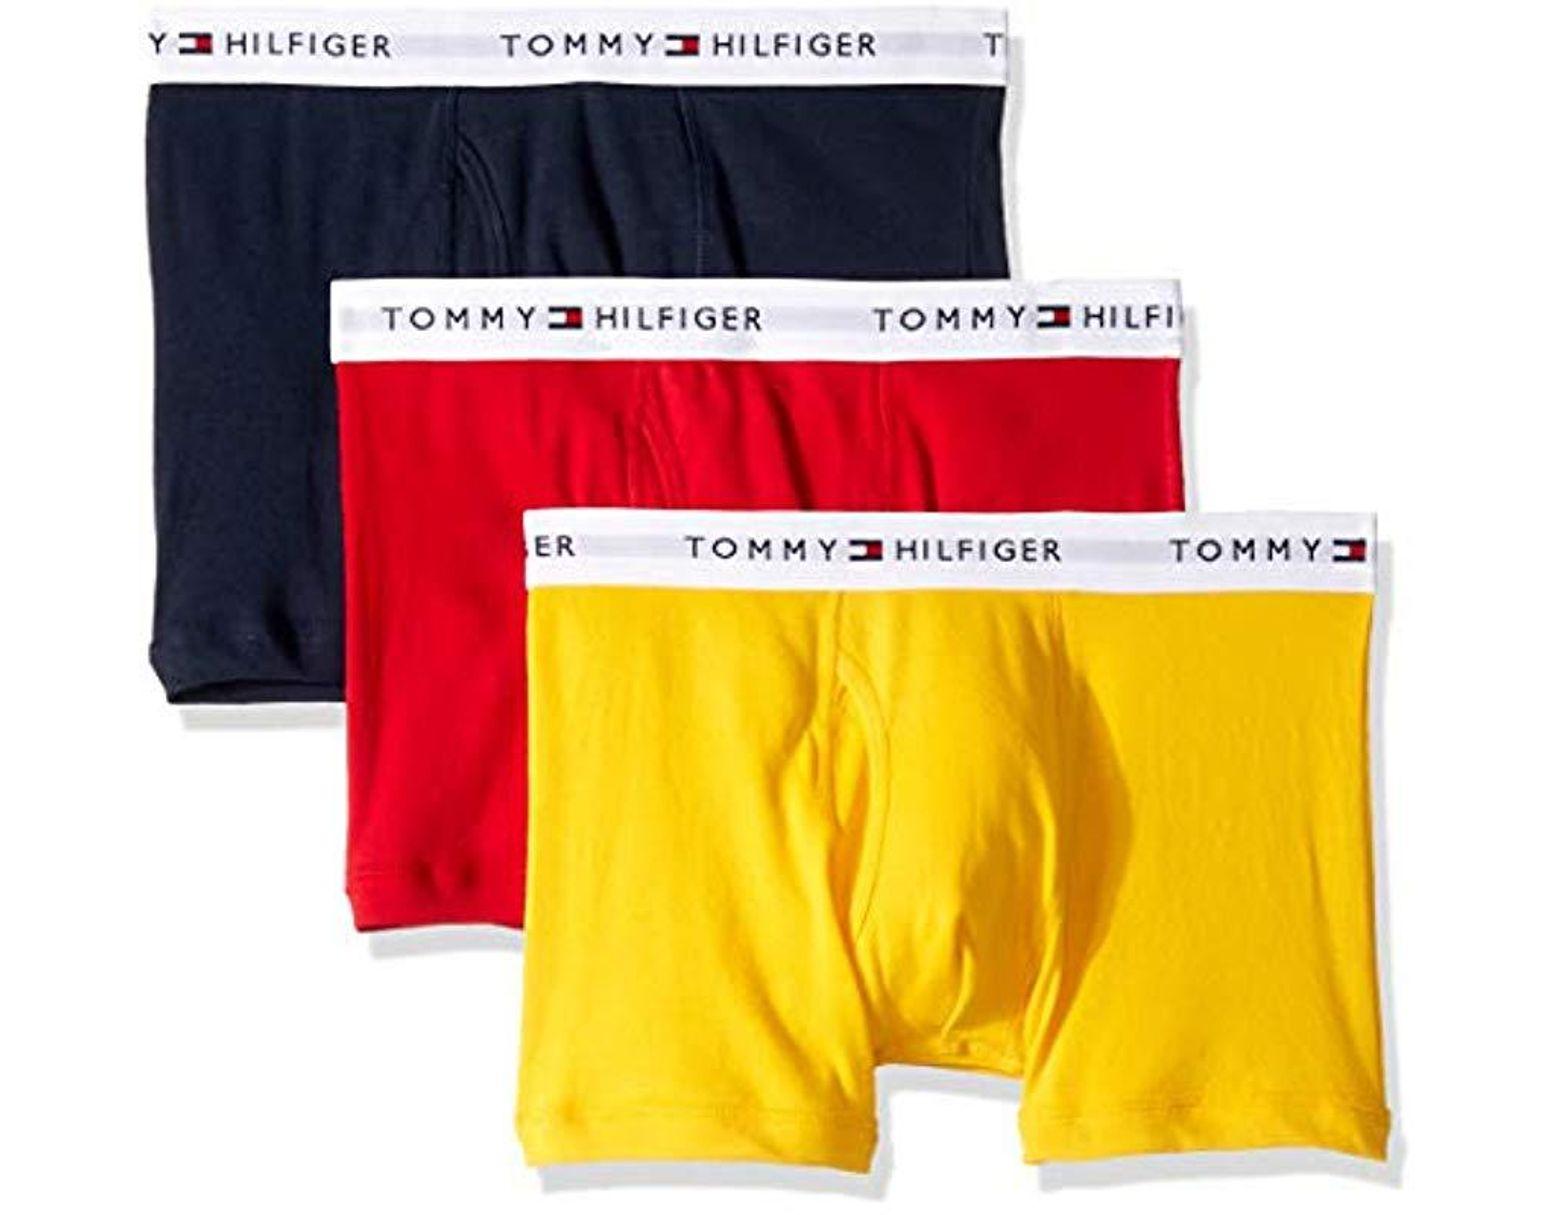 b009bb6eb105 Tommy Hilfiger Underwear 3 Pack Cotton Classics Trunks for Men - Lyst